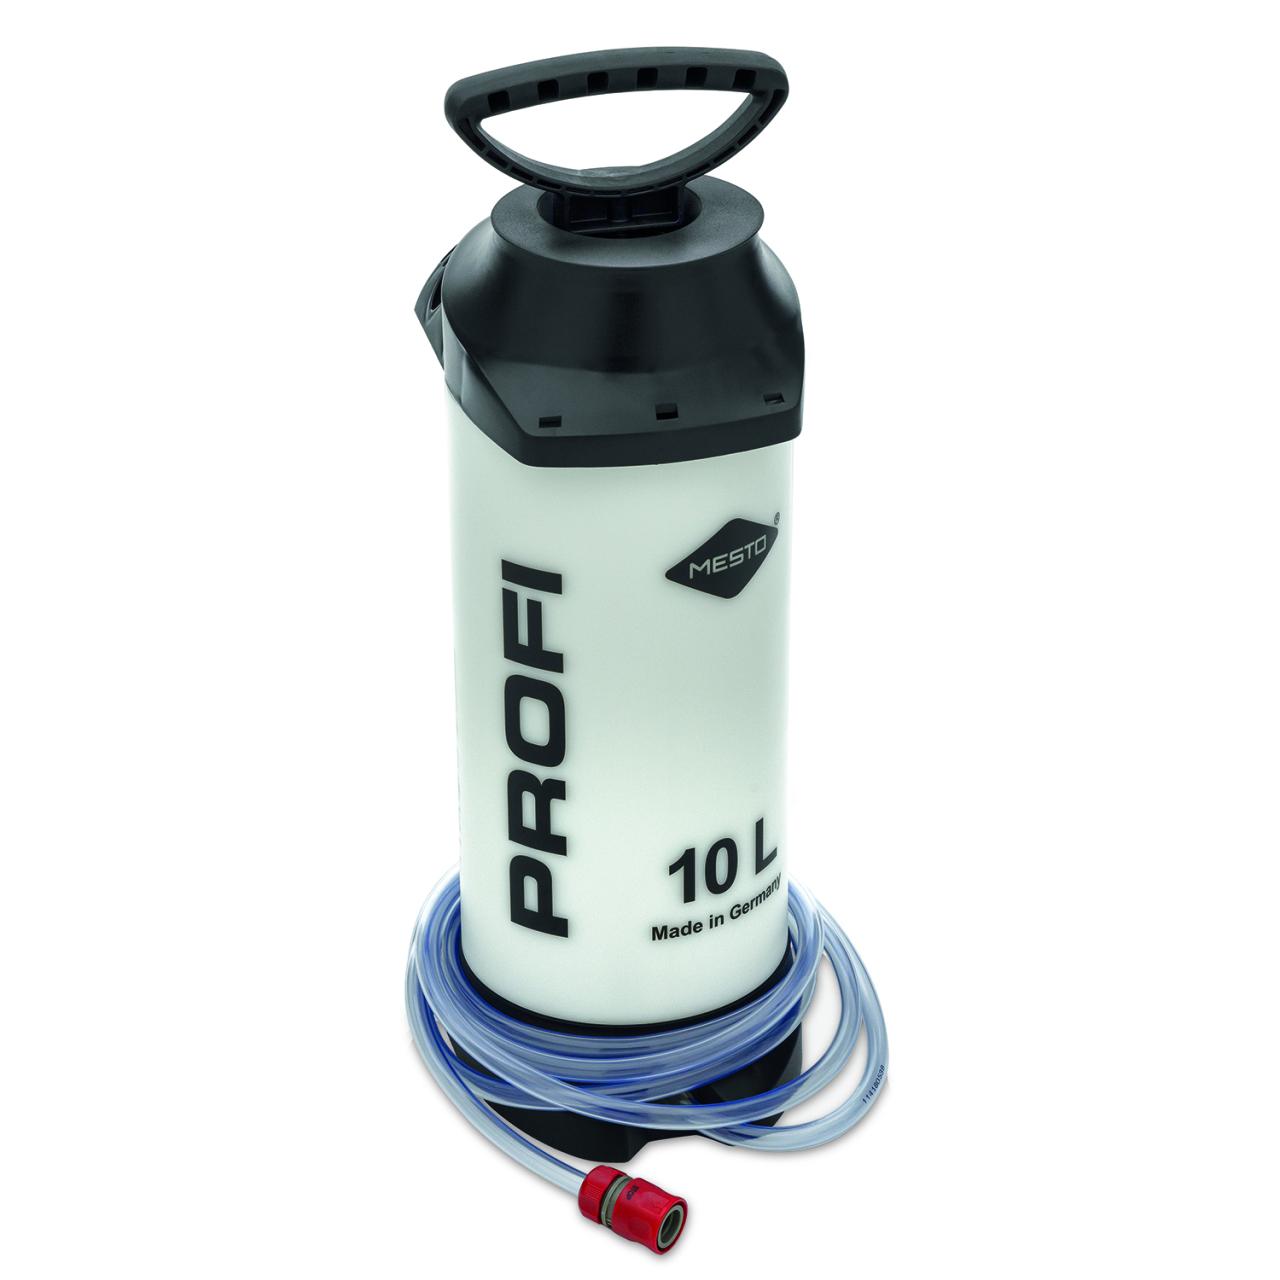 Druckwasserbehälter PROFI H2O 10,0L 3270W